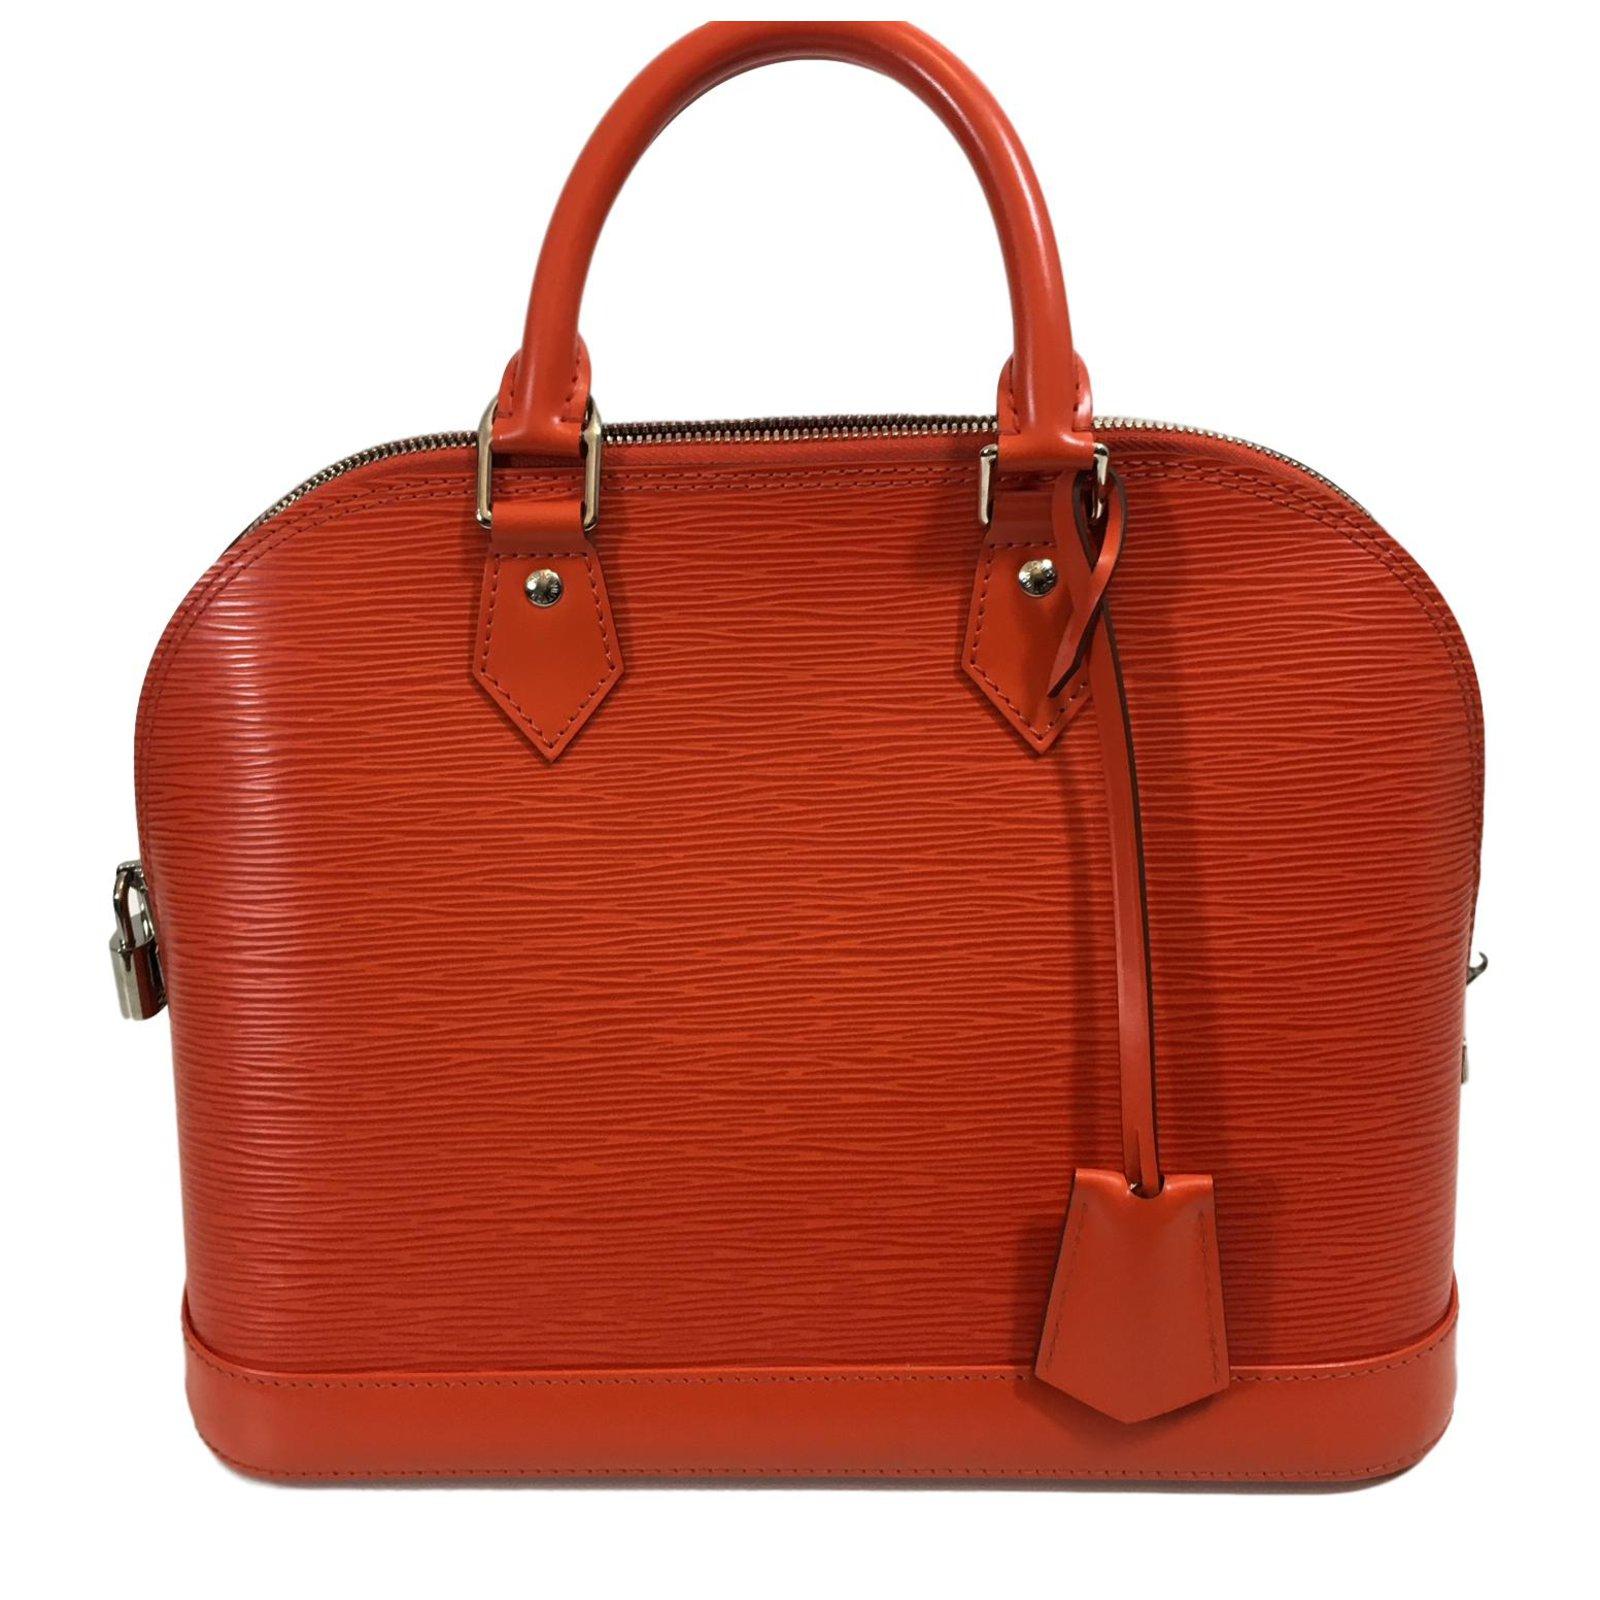 Louis Vuitton Alma Pm Handbags Leather Orange Ref 54197